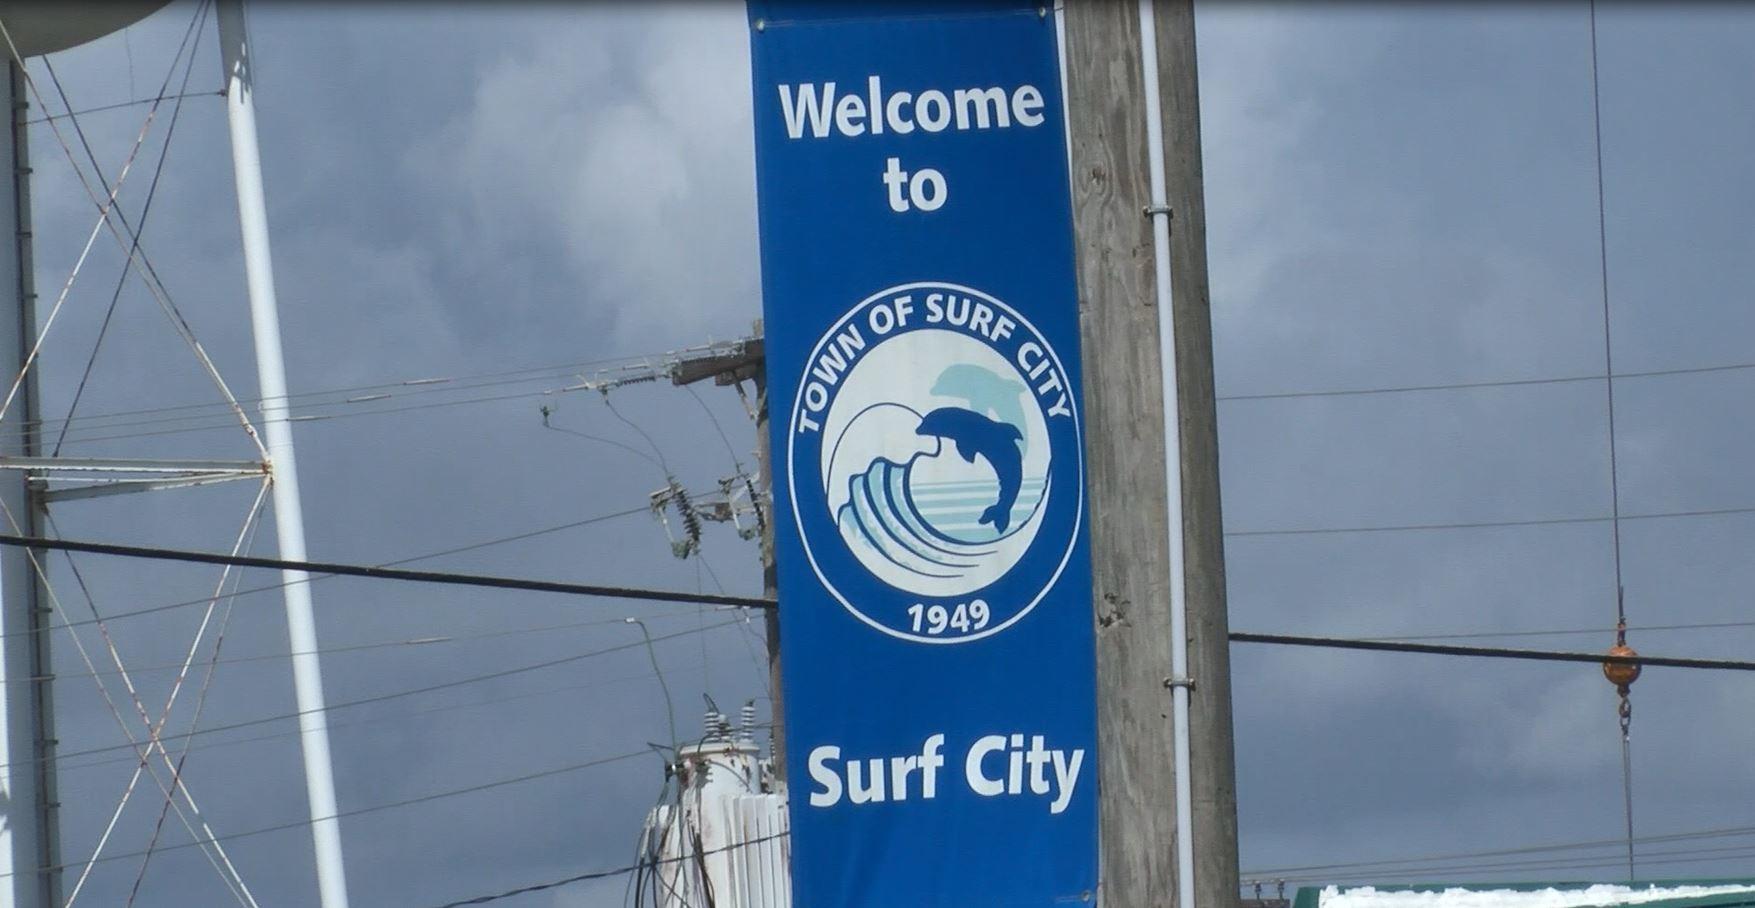 surf city sign_1526506653011.JPG.jpg